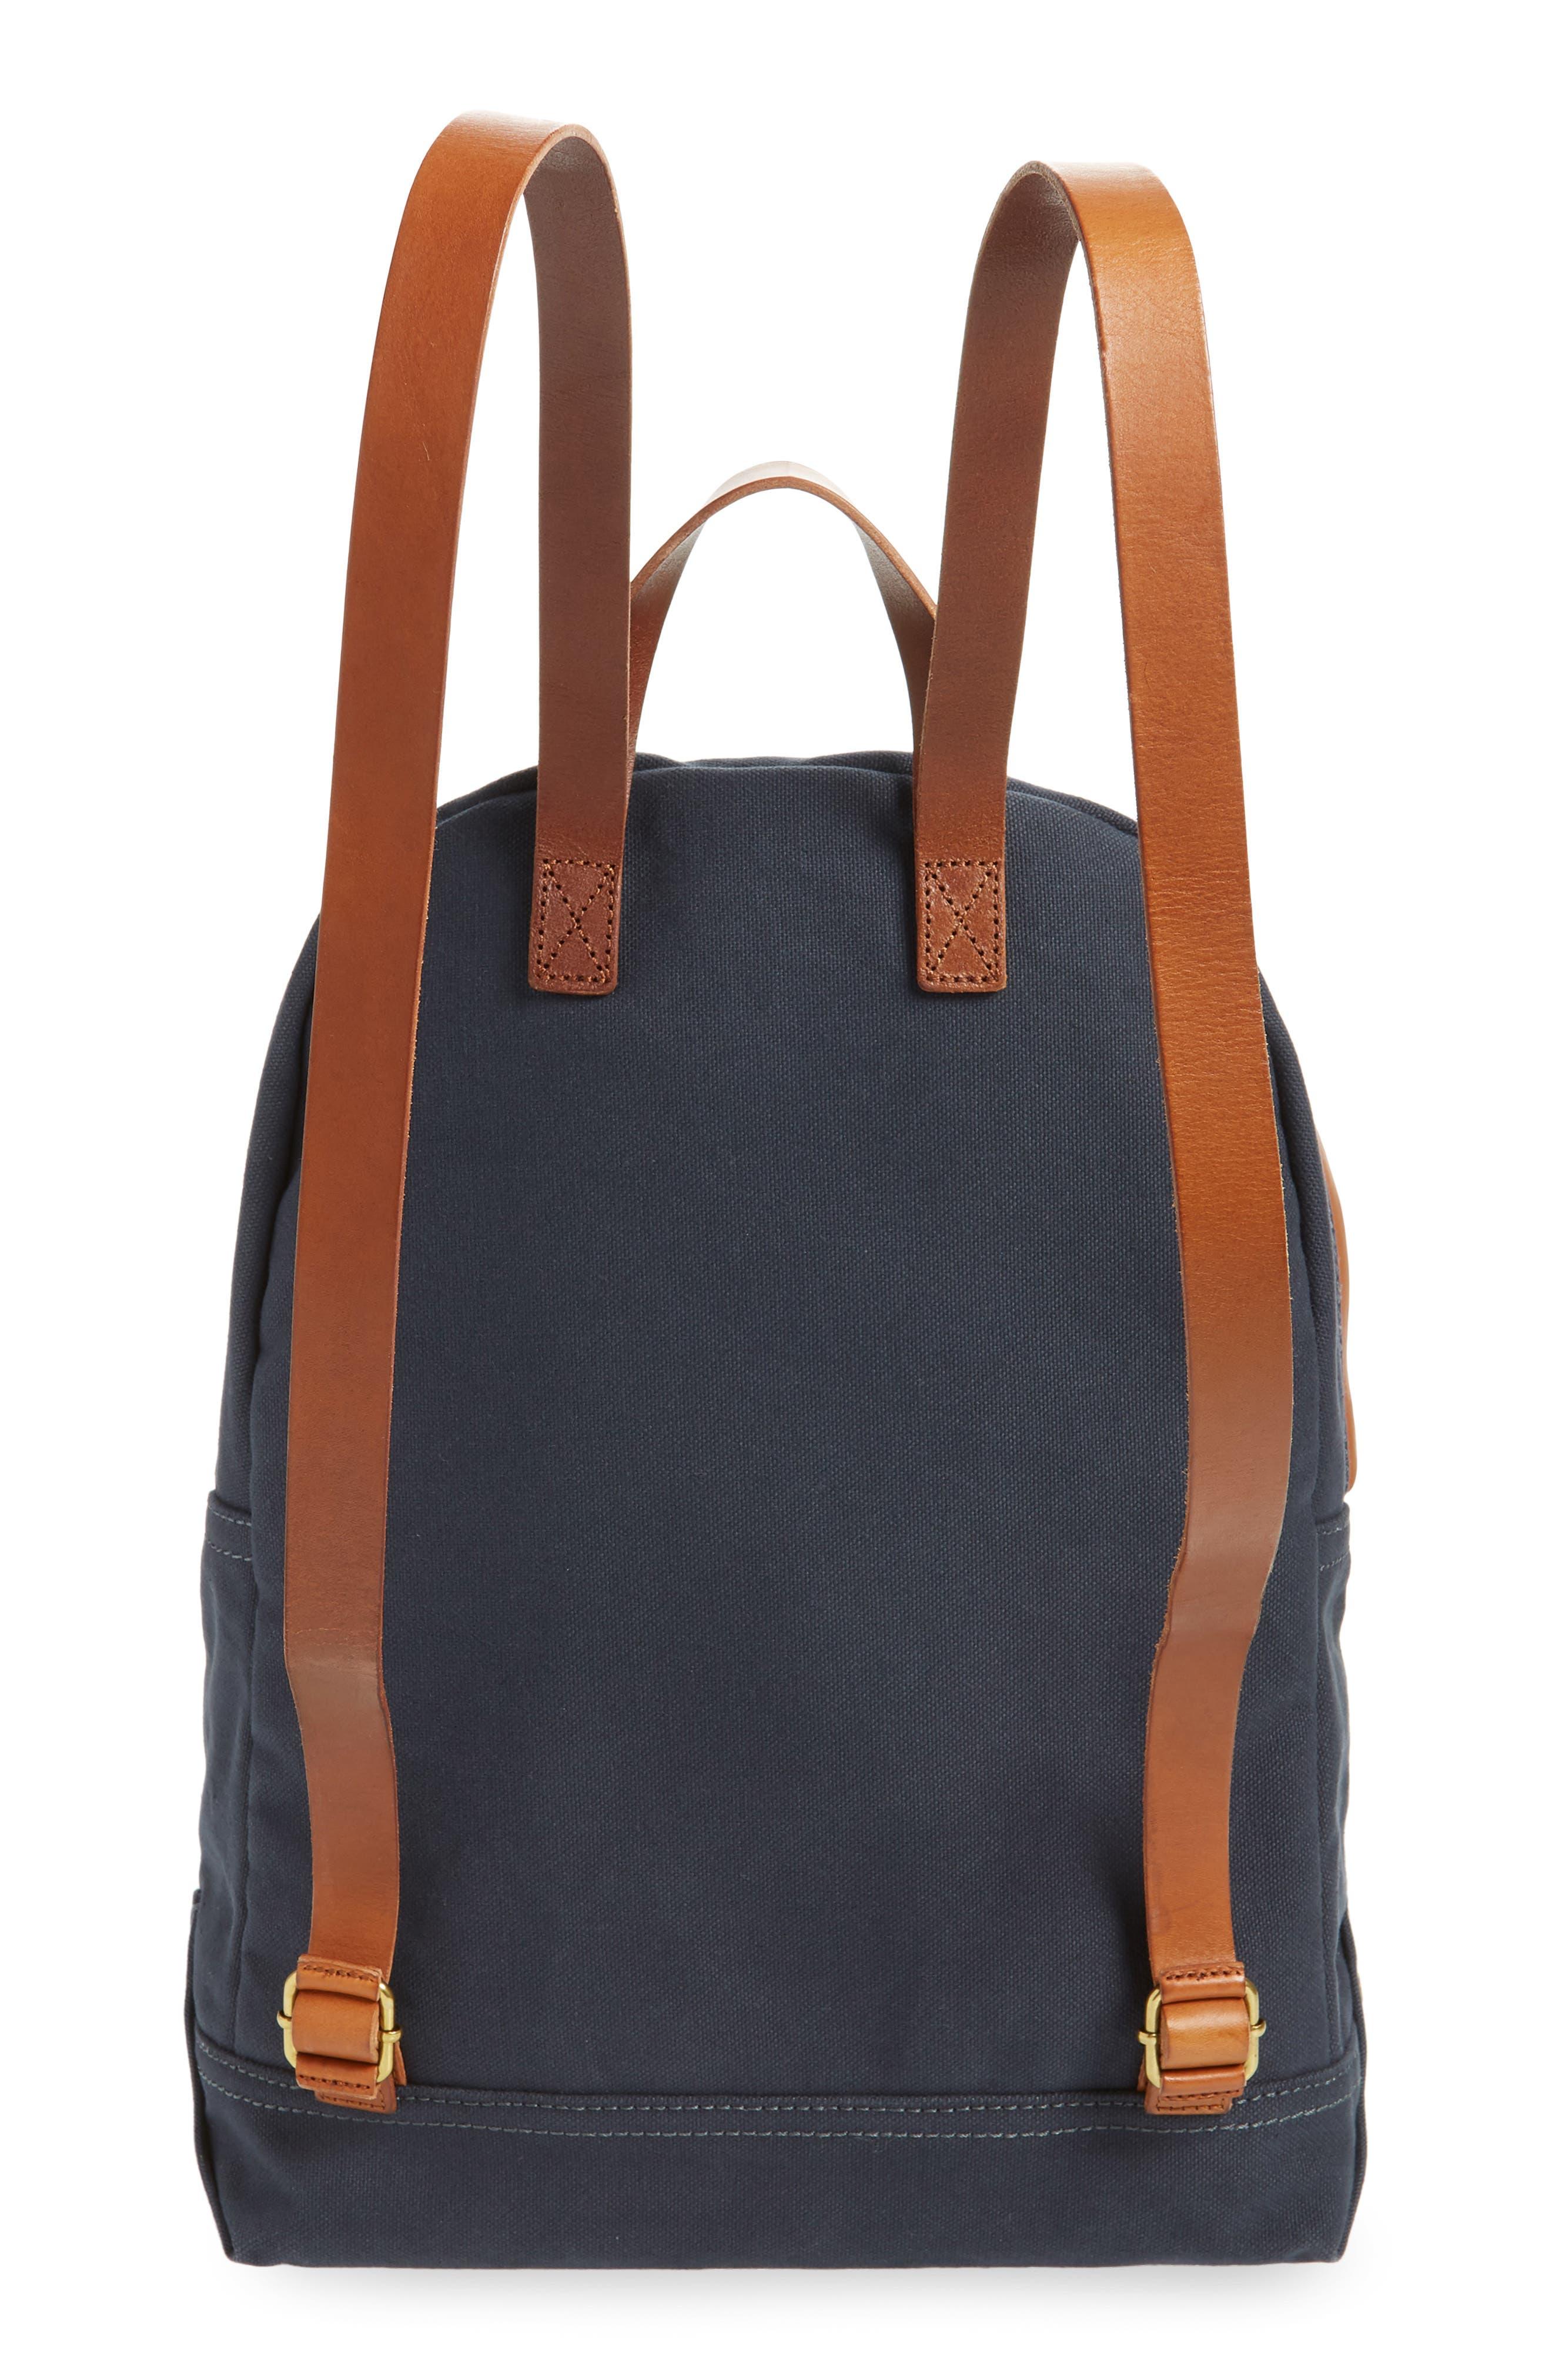 MADEWELL, The Charleston Backpack, Alternate thumbnail 4, color, BLACK SEA